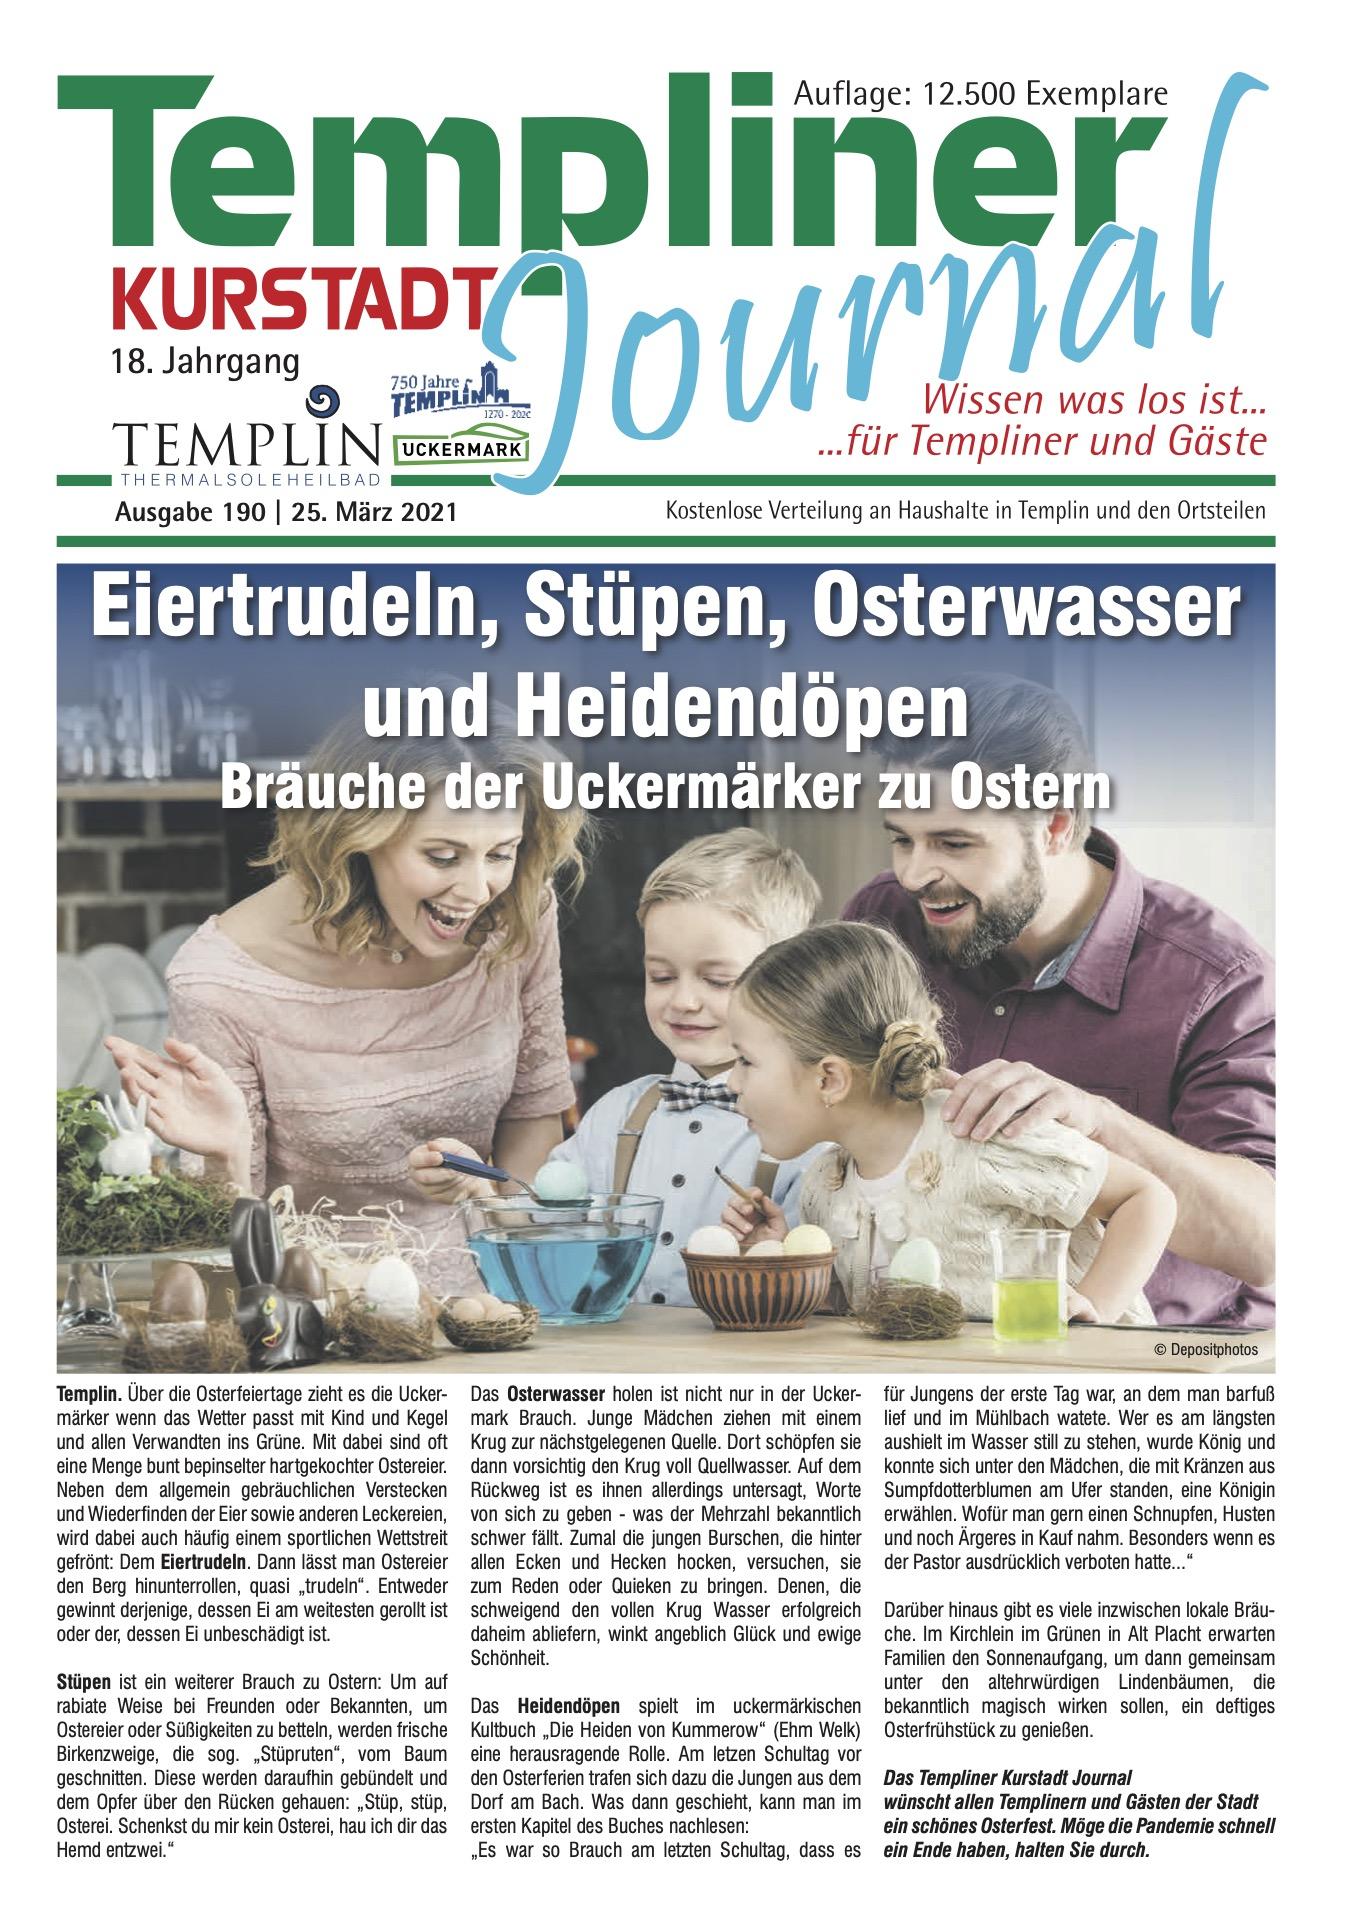 Templiner Kurstadt Journal 190 vom 25.03.2021